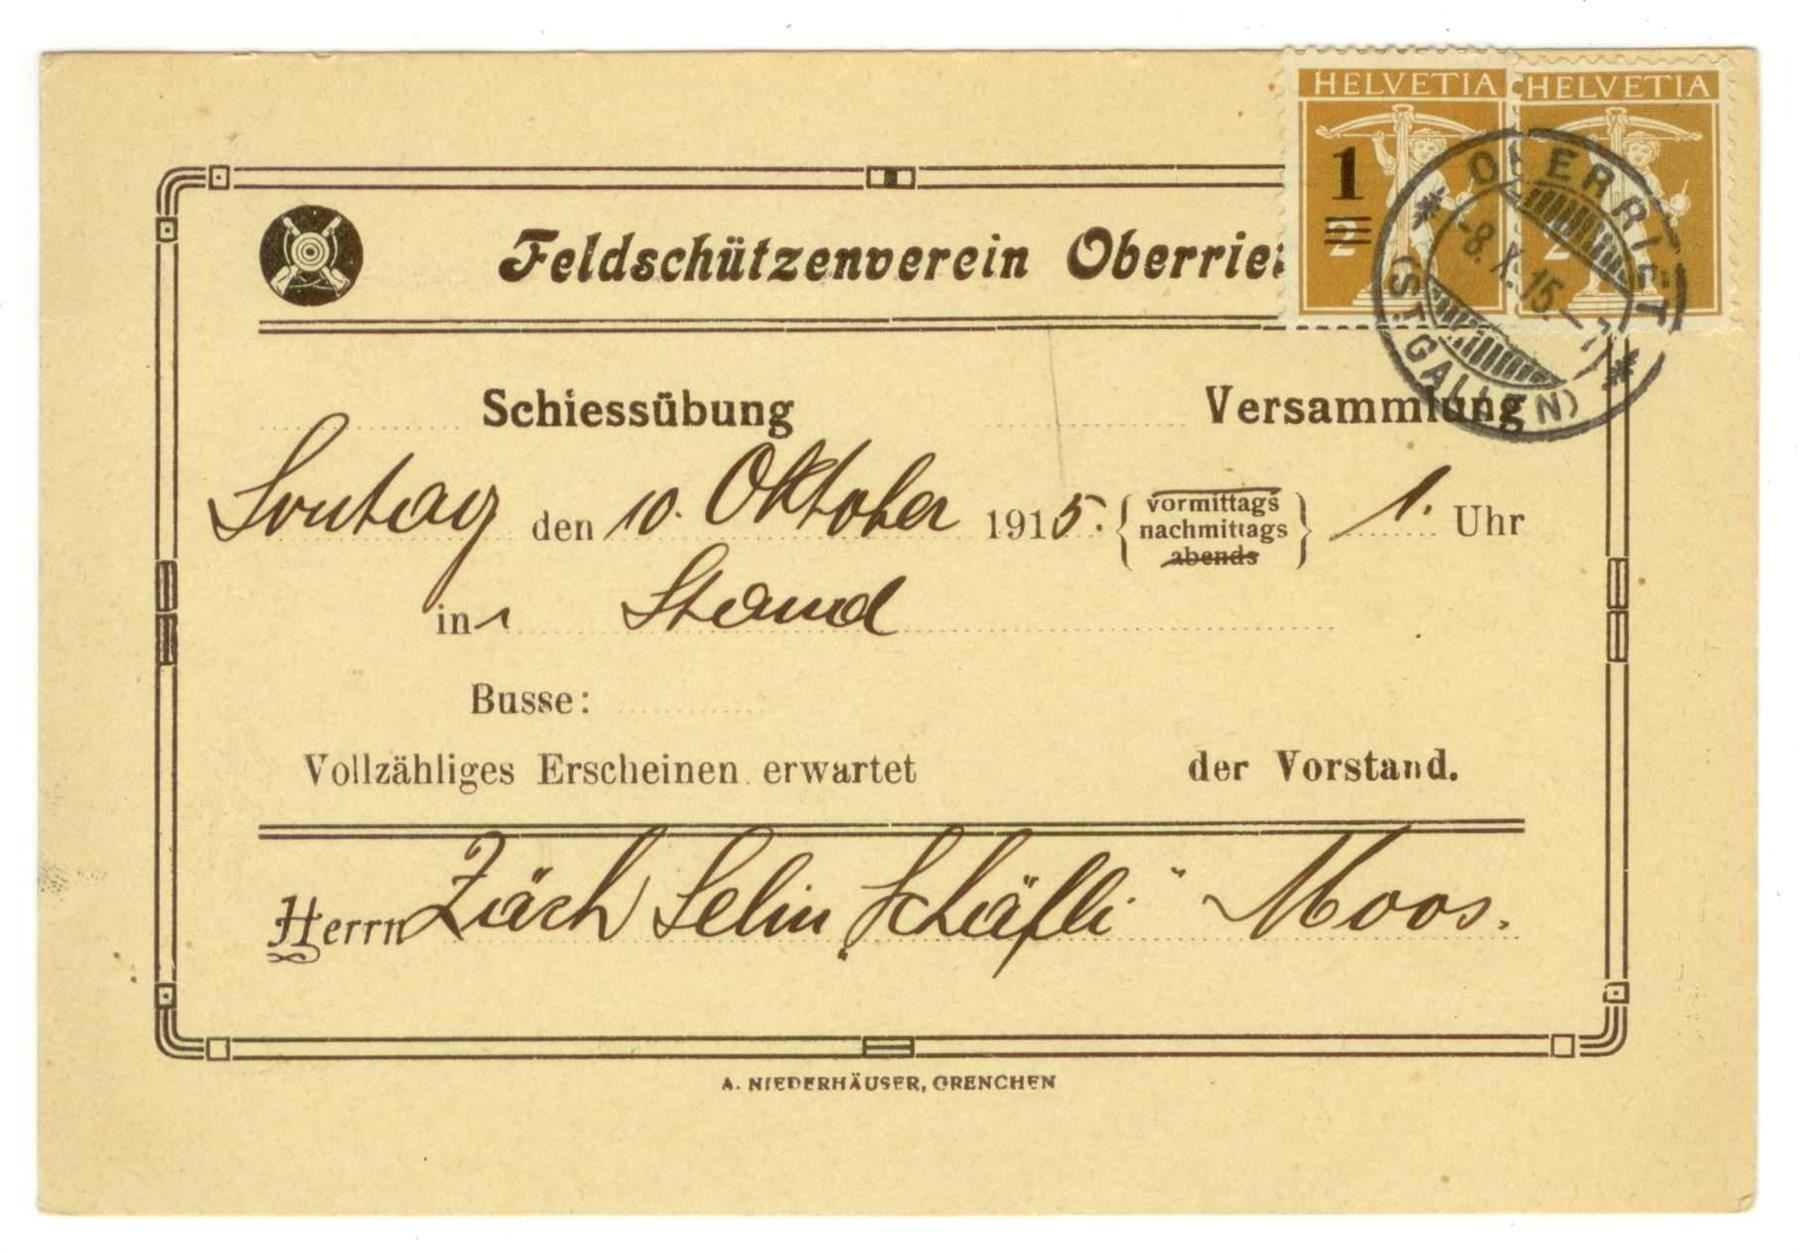 Feldschützenverein Oberriet (1915)